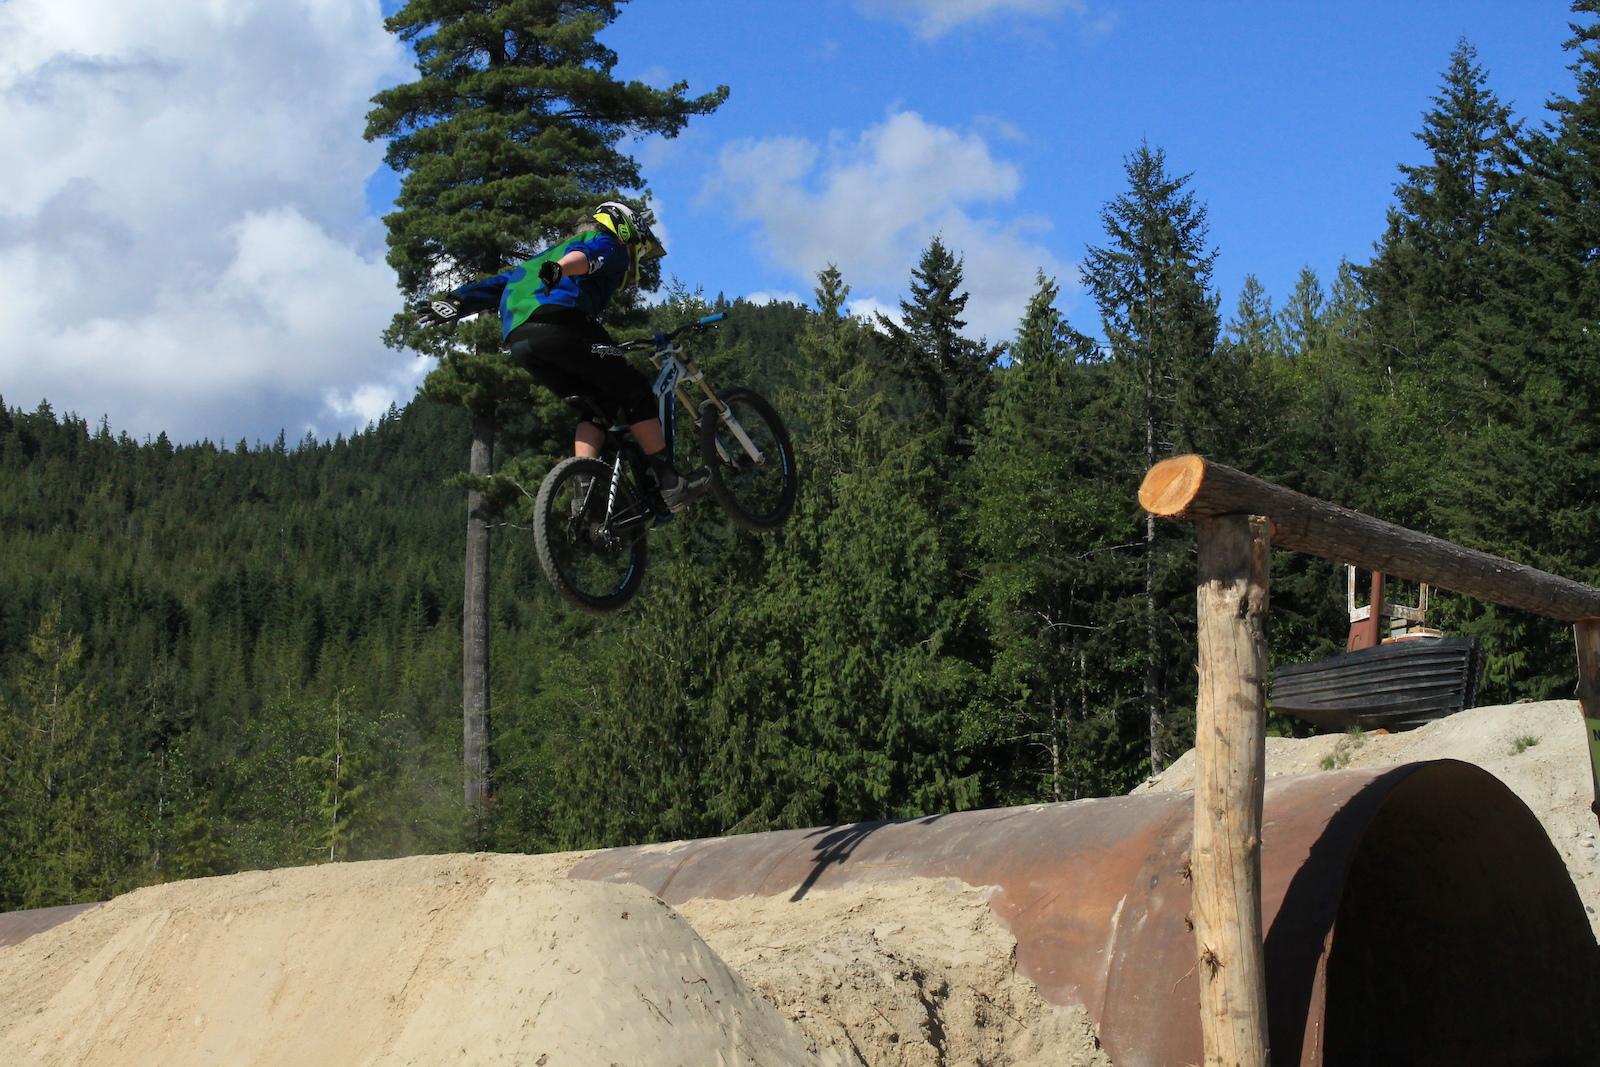 Noah Allmans suicides Camping and biking on the sunshine coast  Coast Gravity park